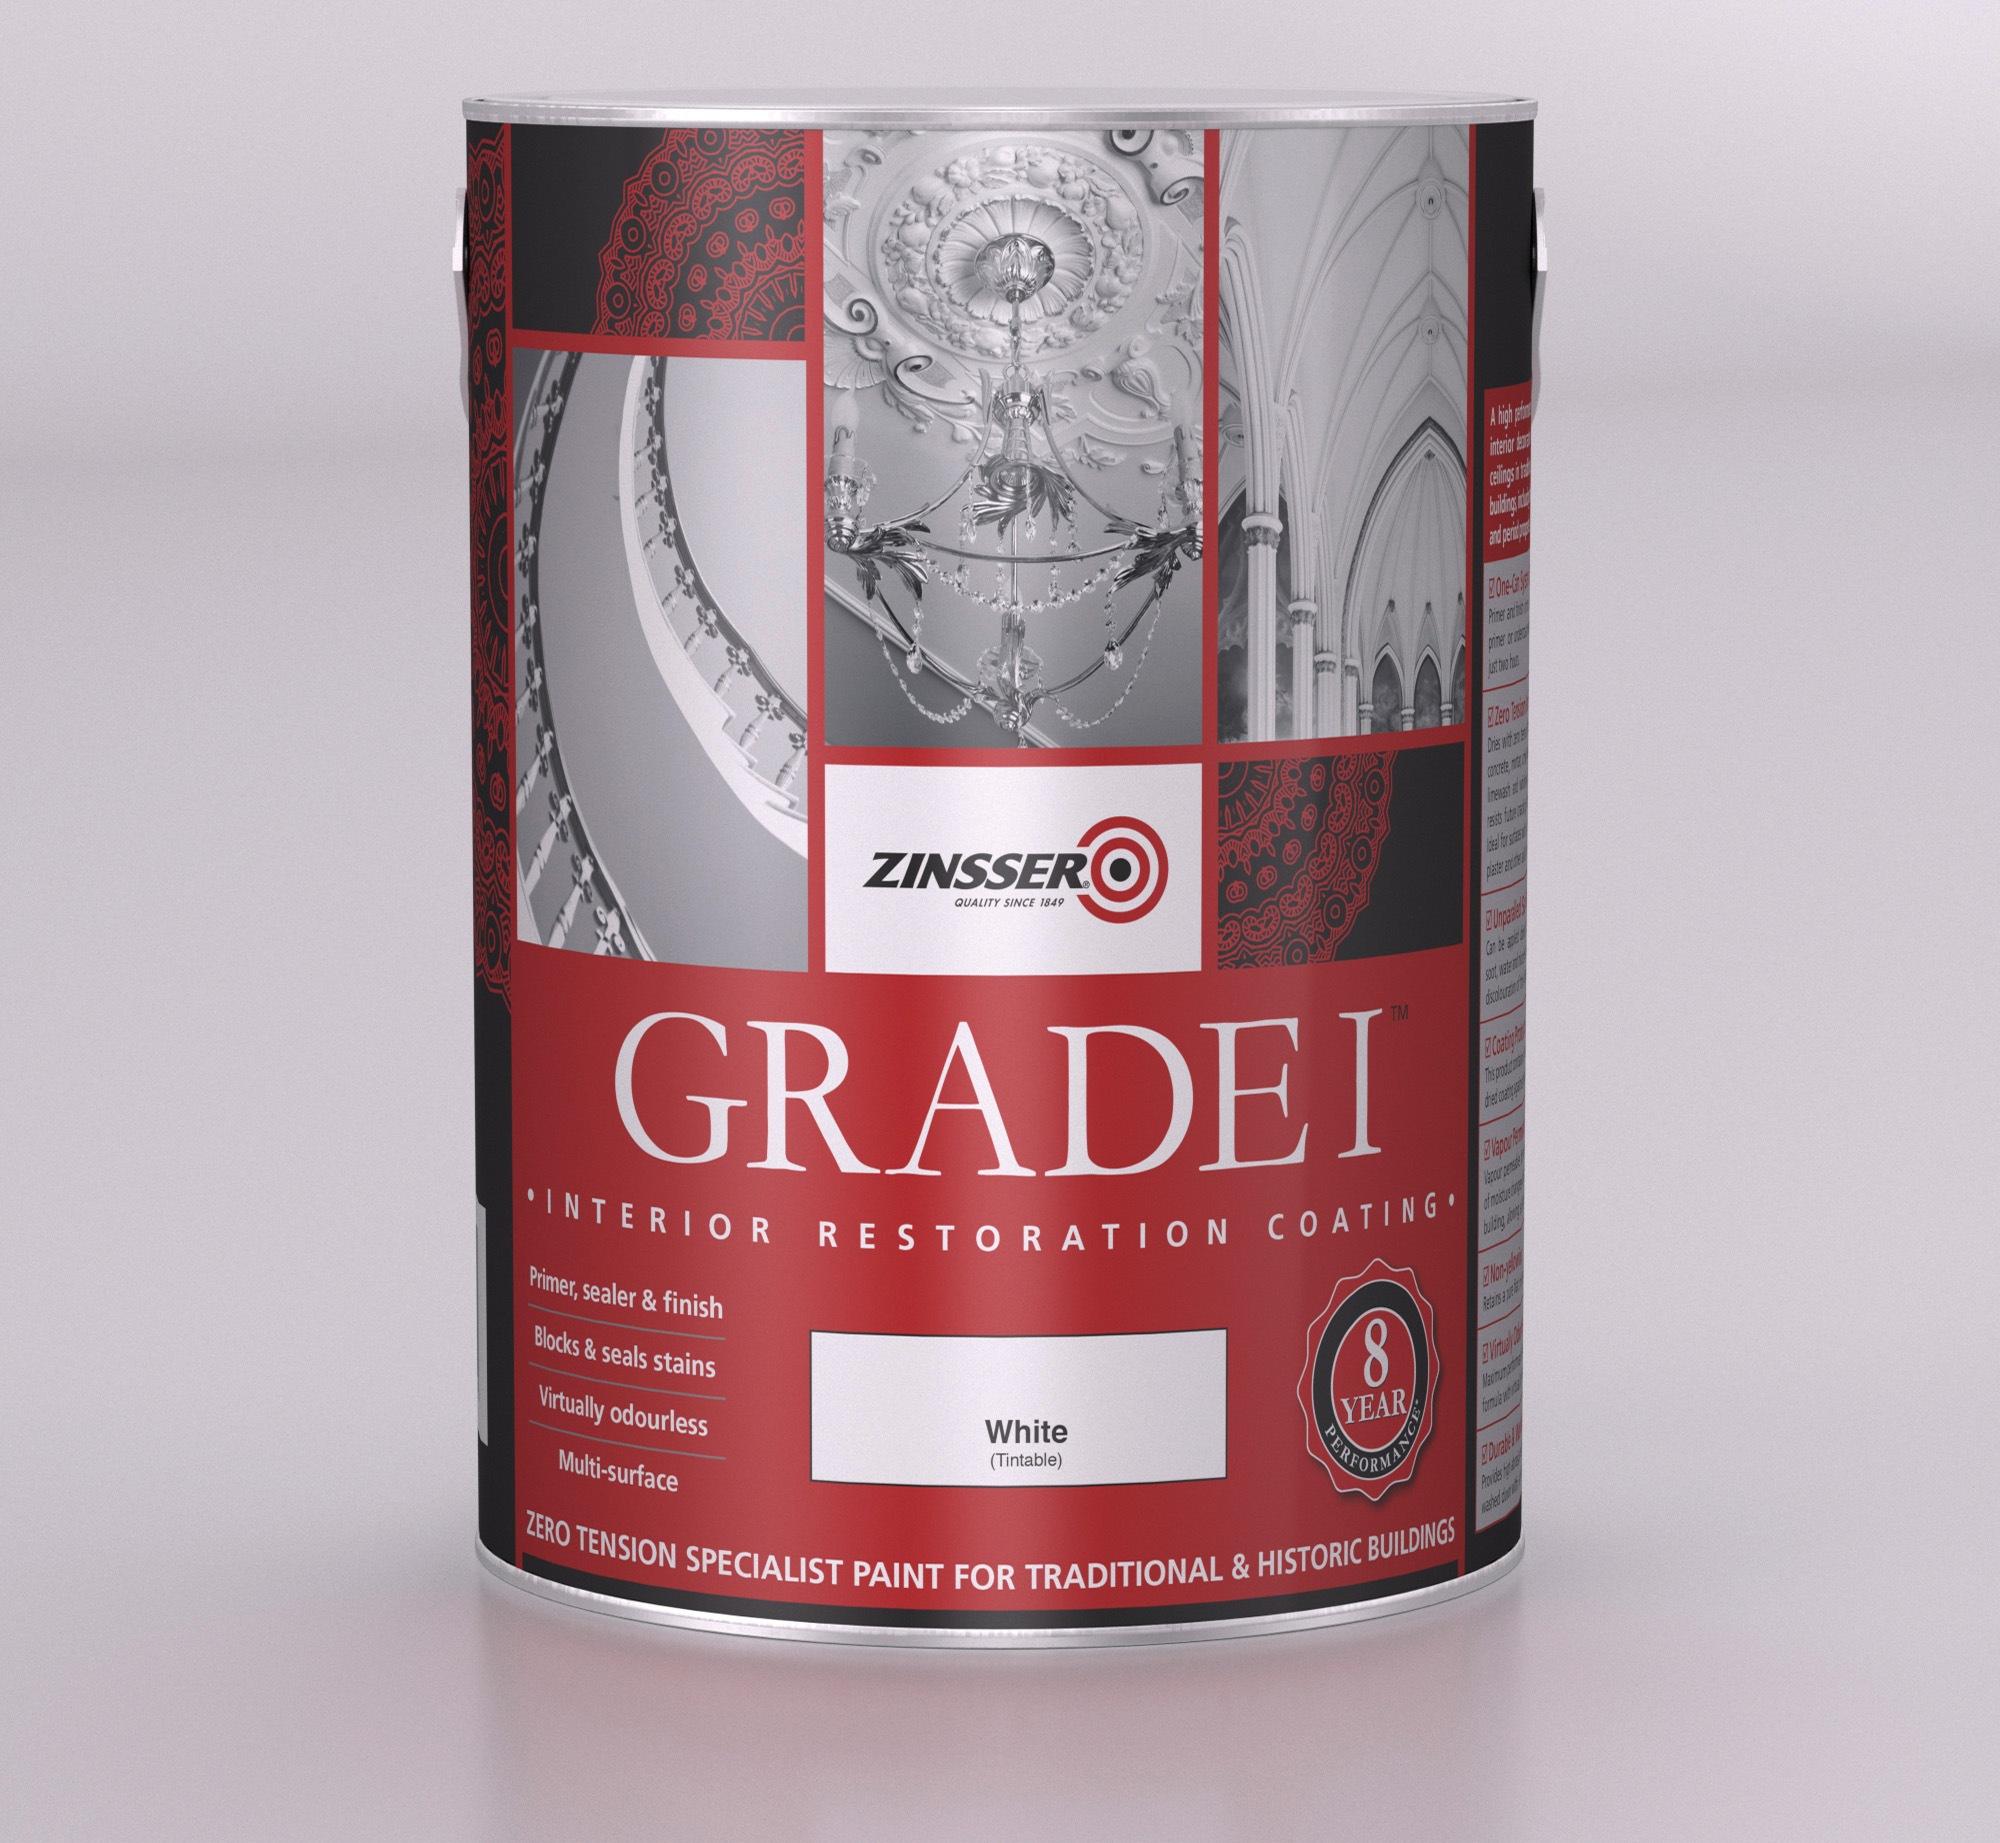 Zinsser Grade 1 Sealer Andrews Coatings Limited